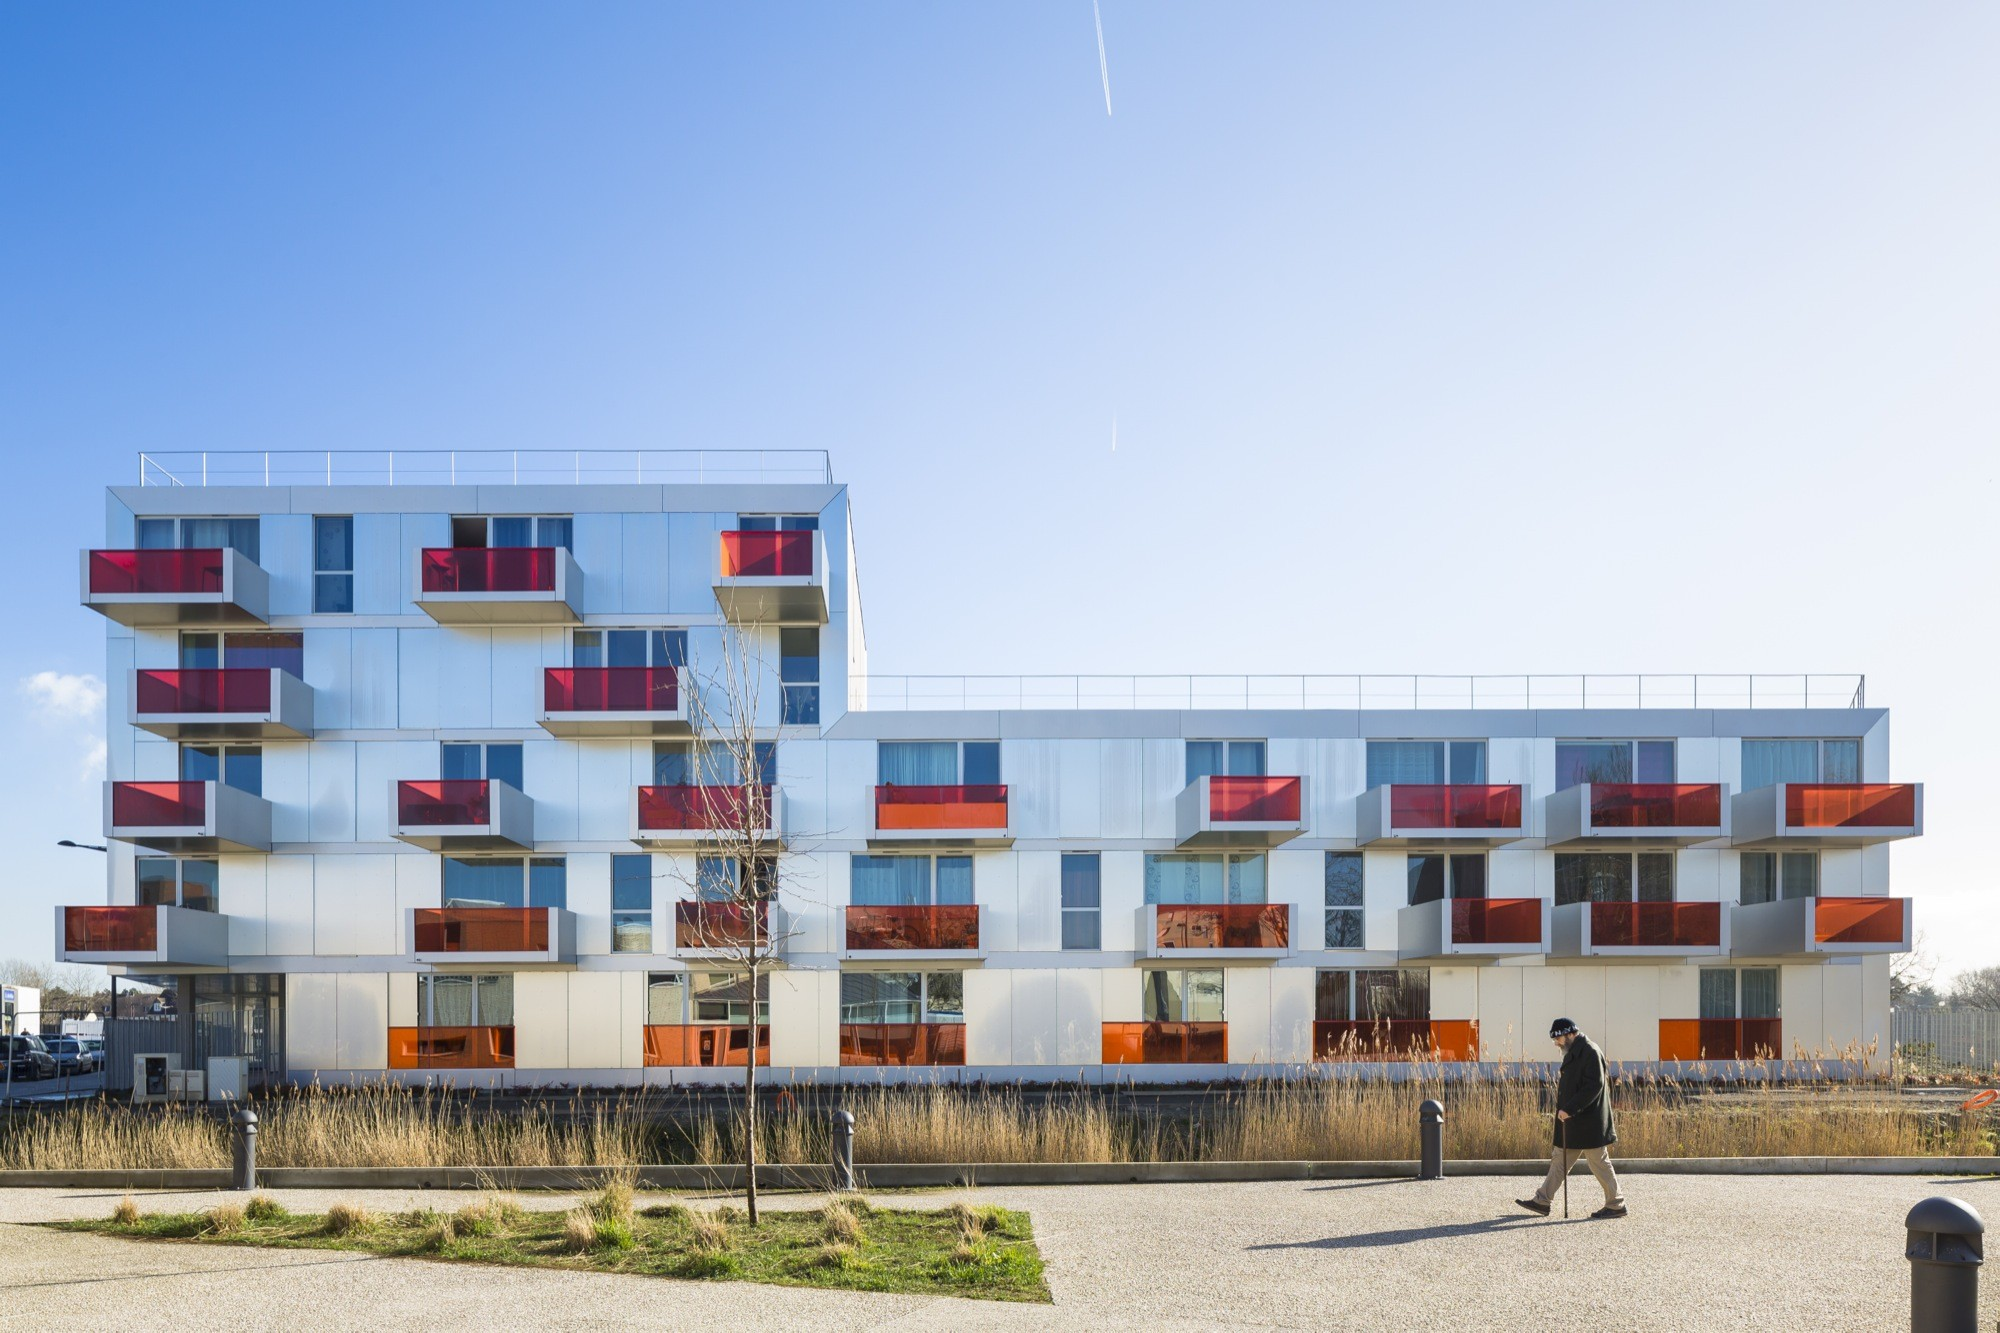 Grand Synthe - Place Du Courghain / Philippe Dubus Architecte, © Sergio Grazia